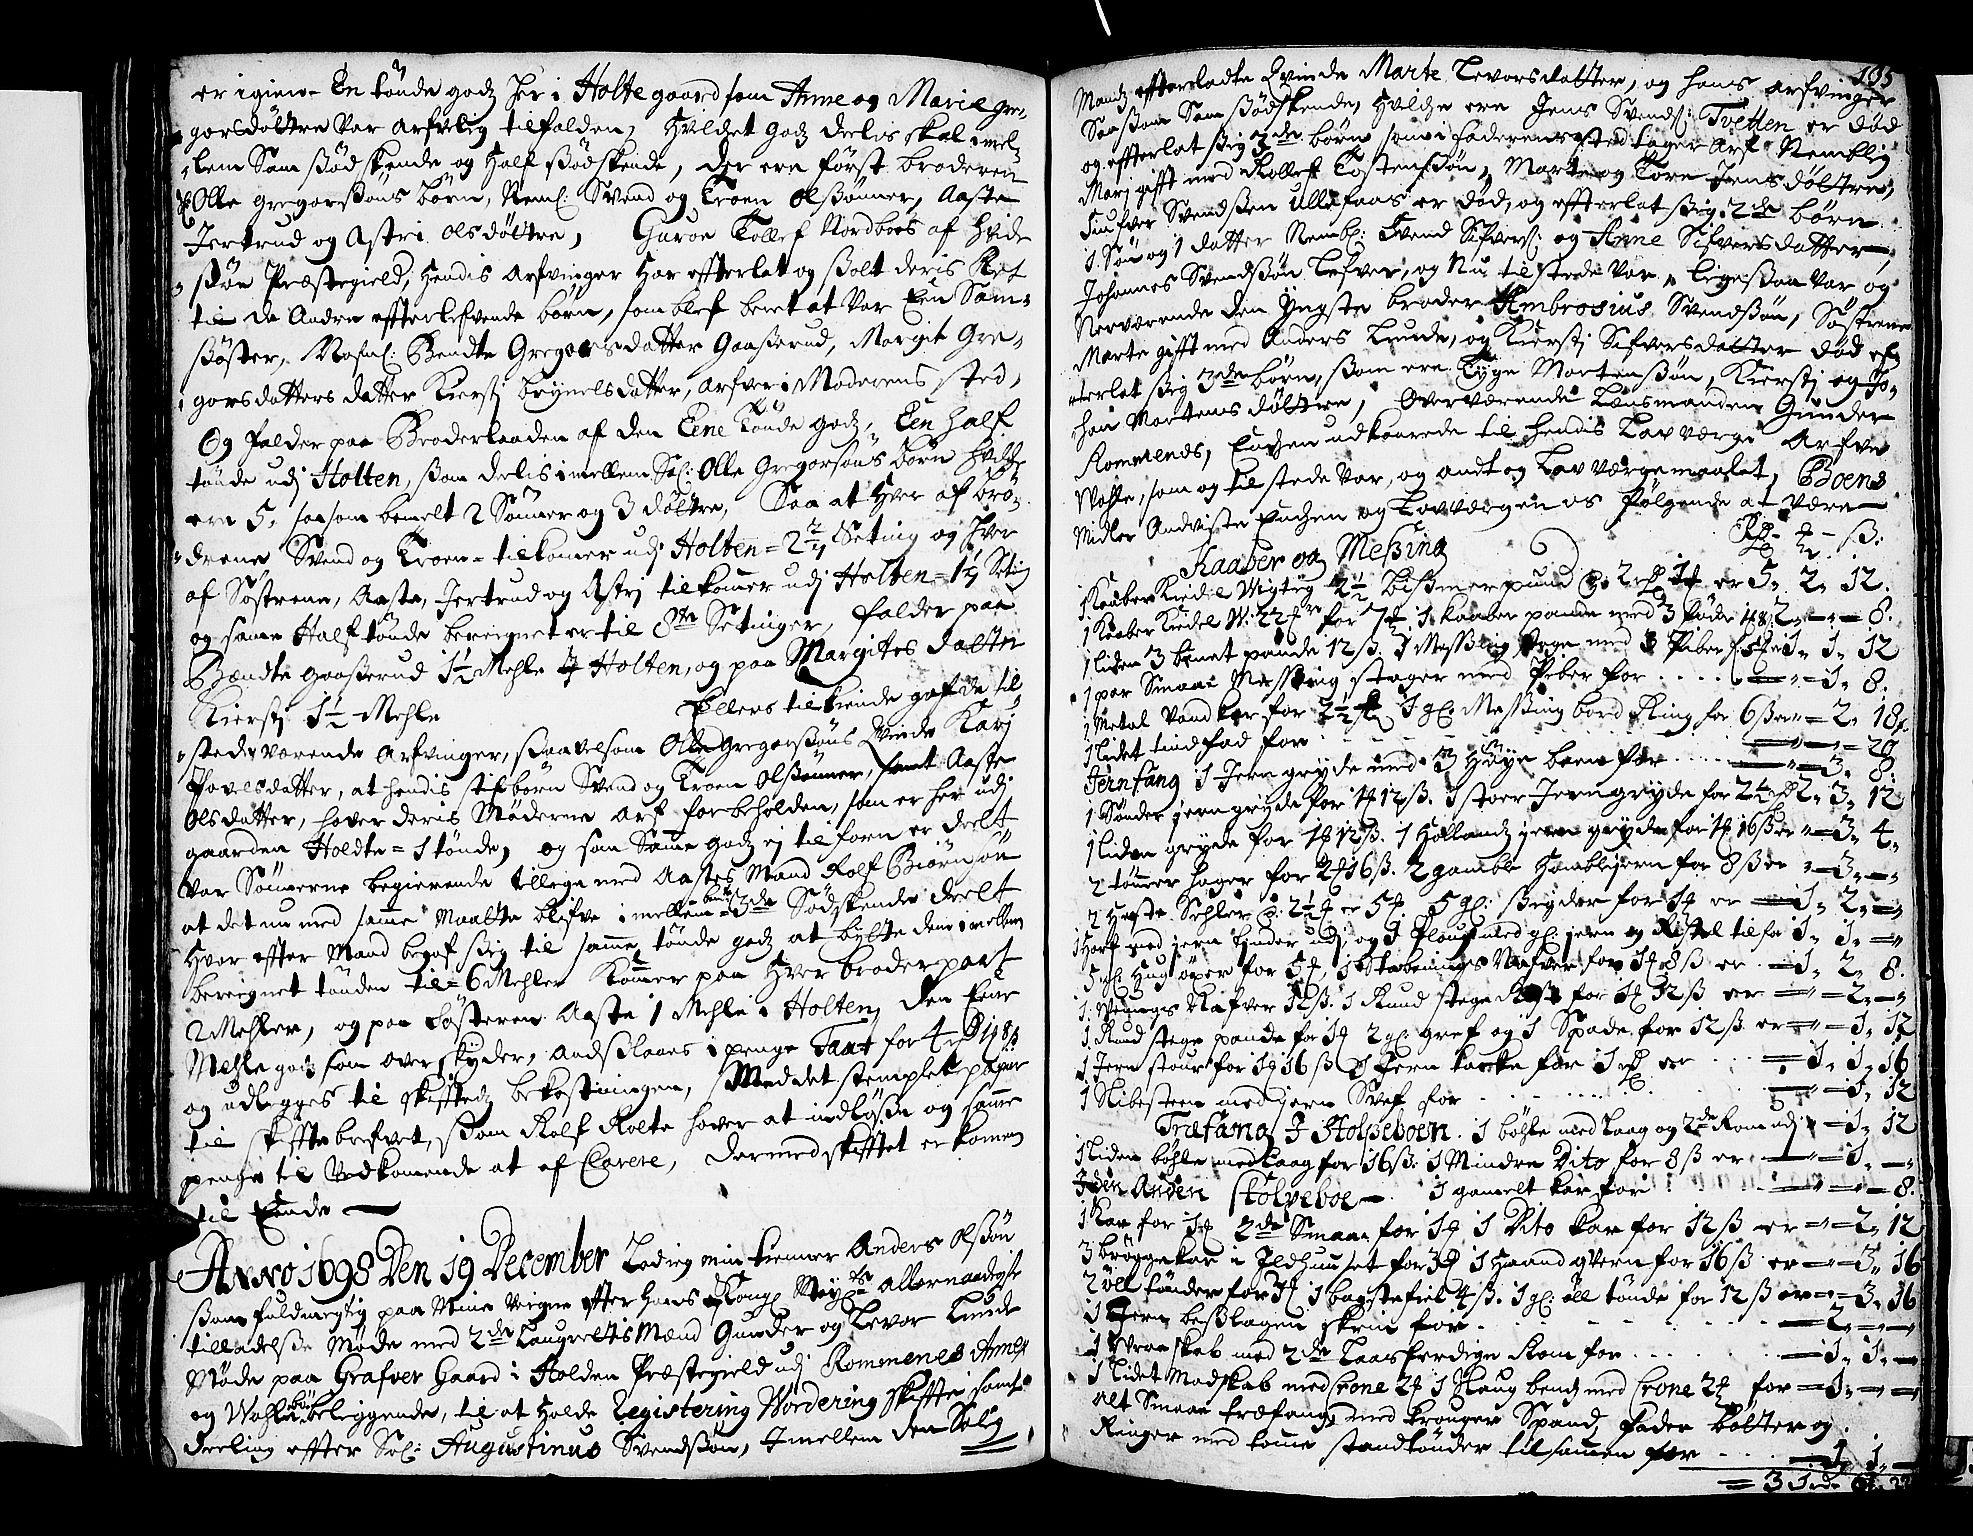 SAKO, Nedre Telemark sorenskriveri, H/Hb/Hba/L0004: Skifteprotokoll , 1696-1701, s. 134b-135a